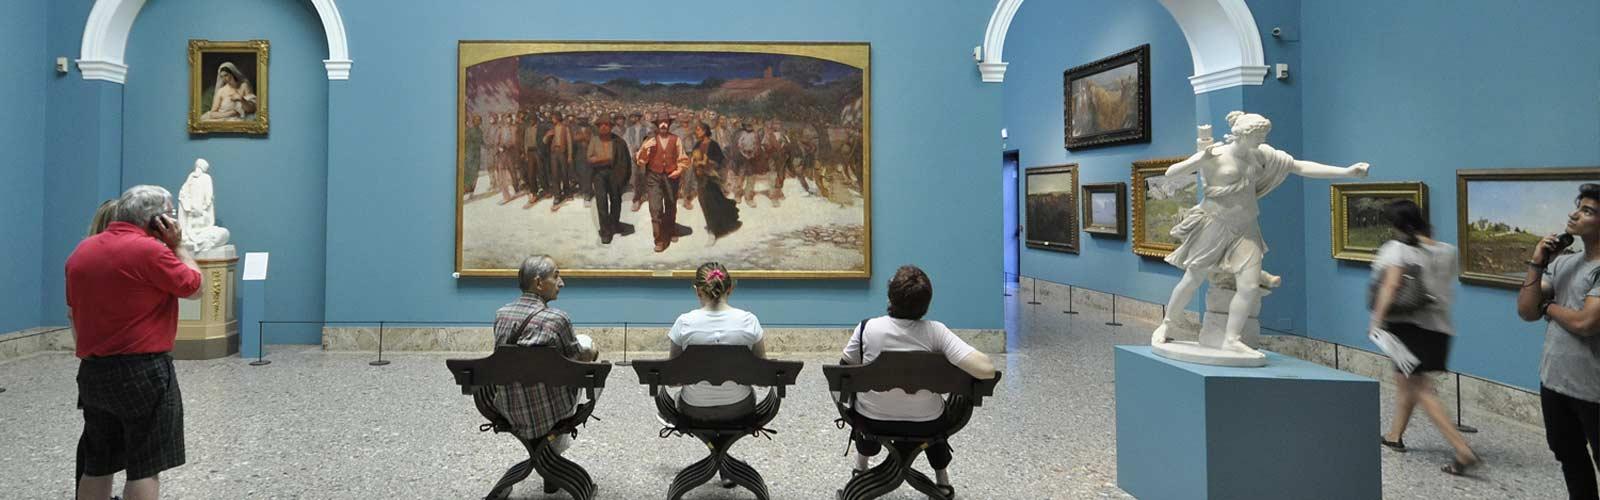 Foto amatoriali in Pinacoteca